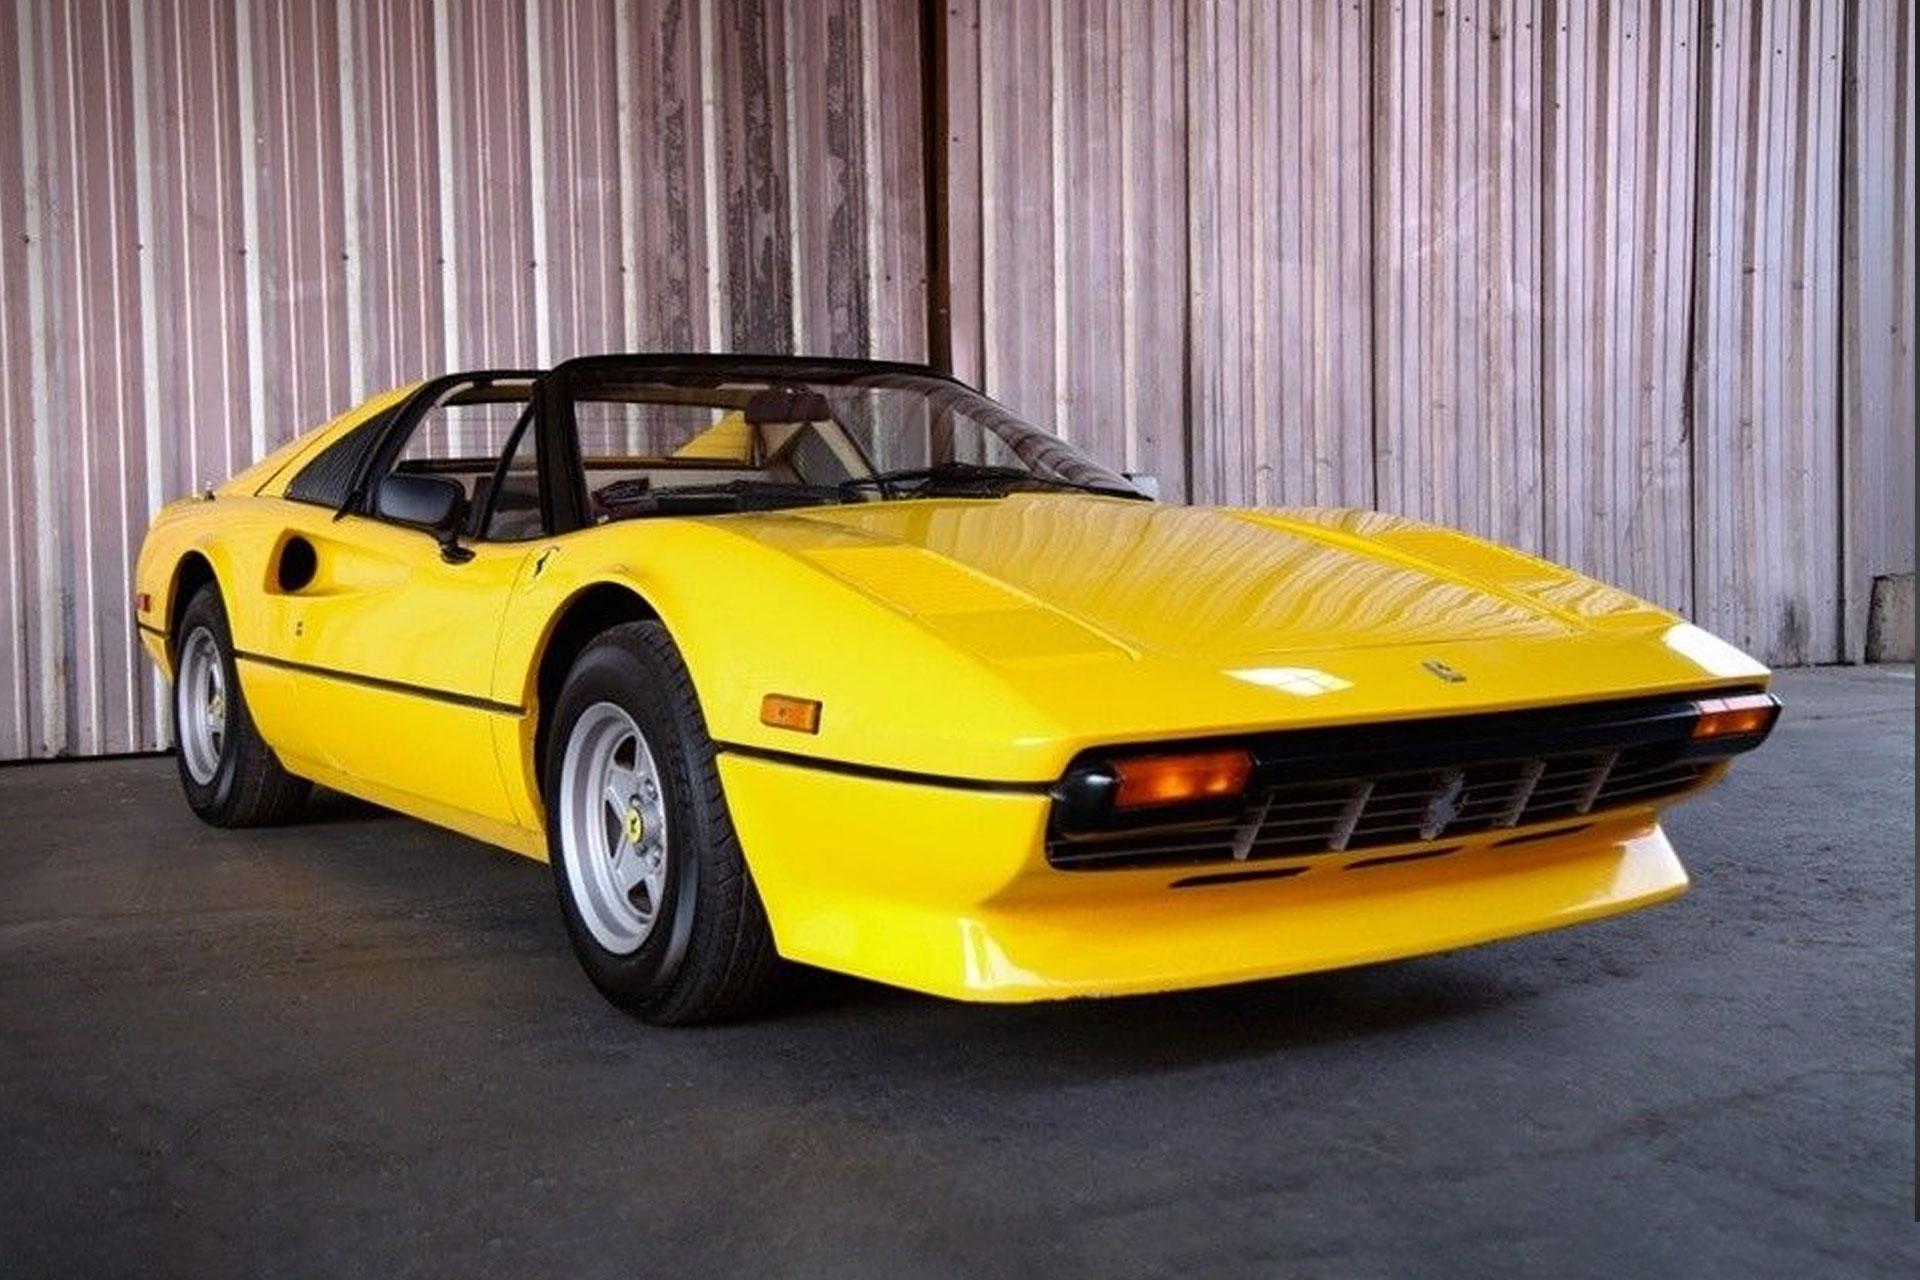 Miles Davis' 1980 Ferrari 308 GTSI Coupe